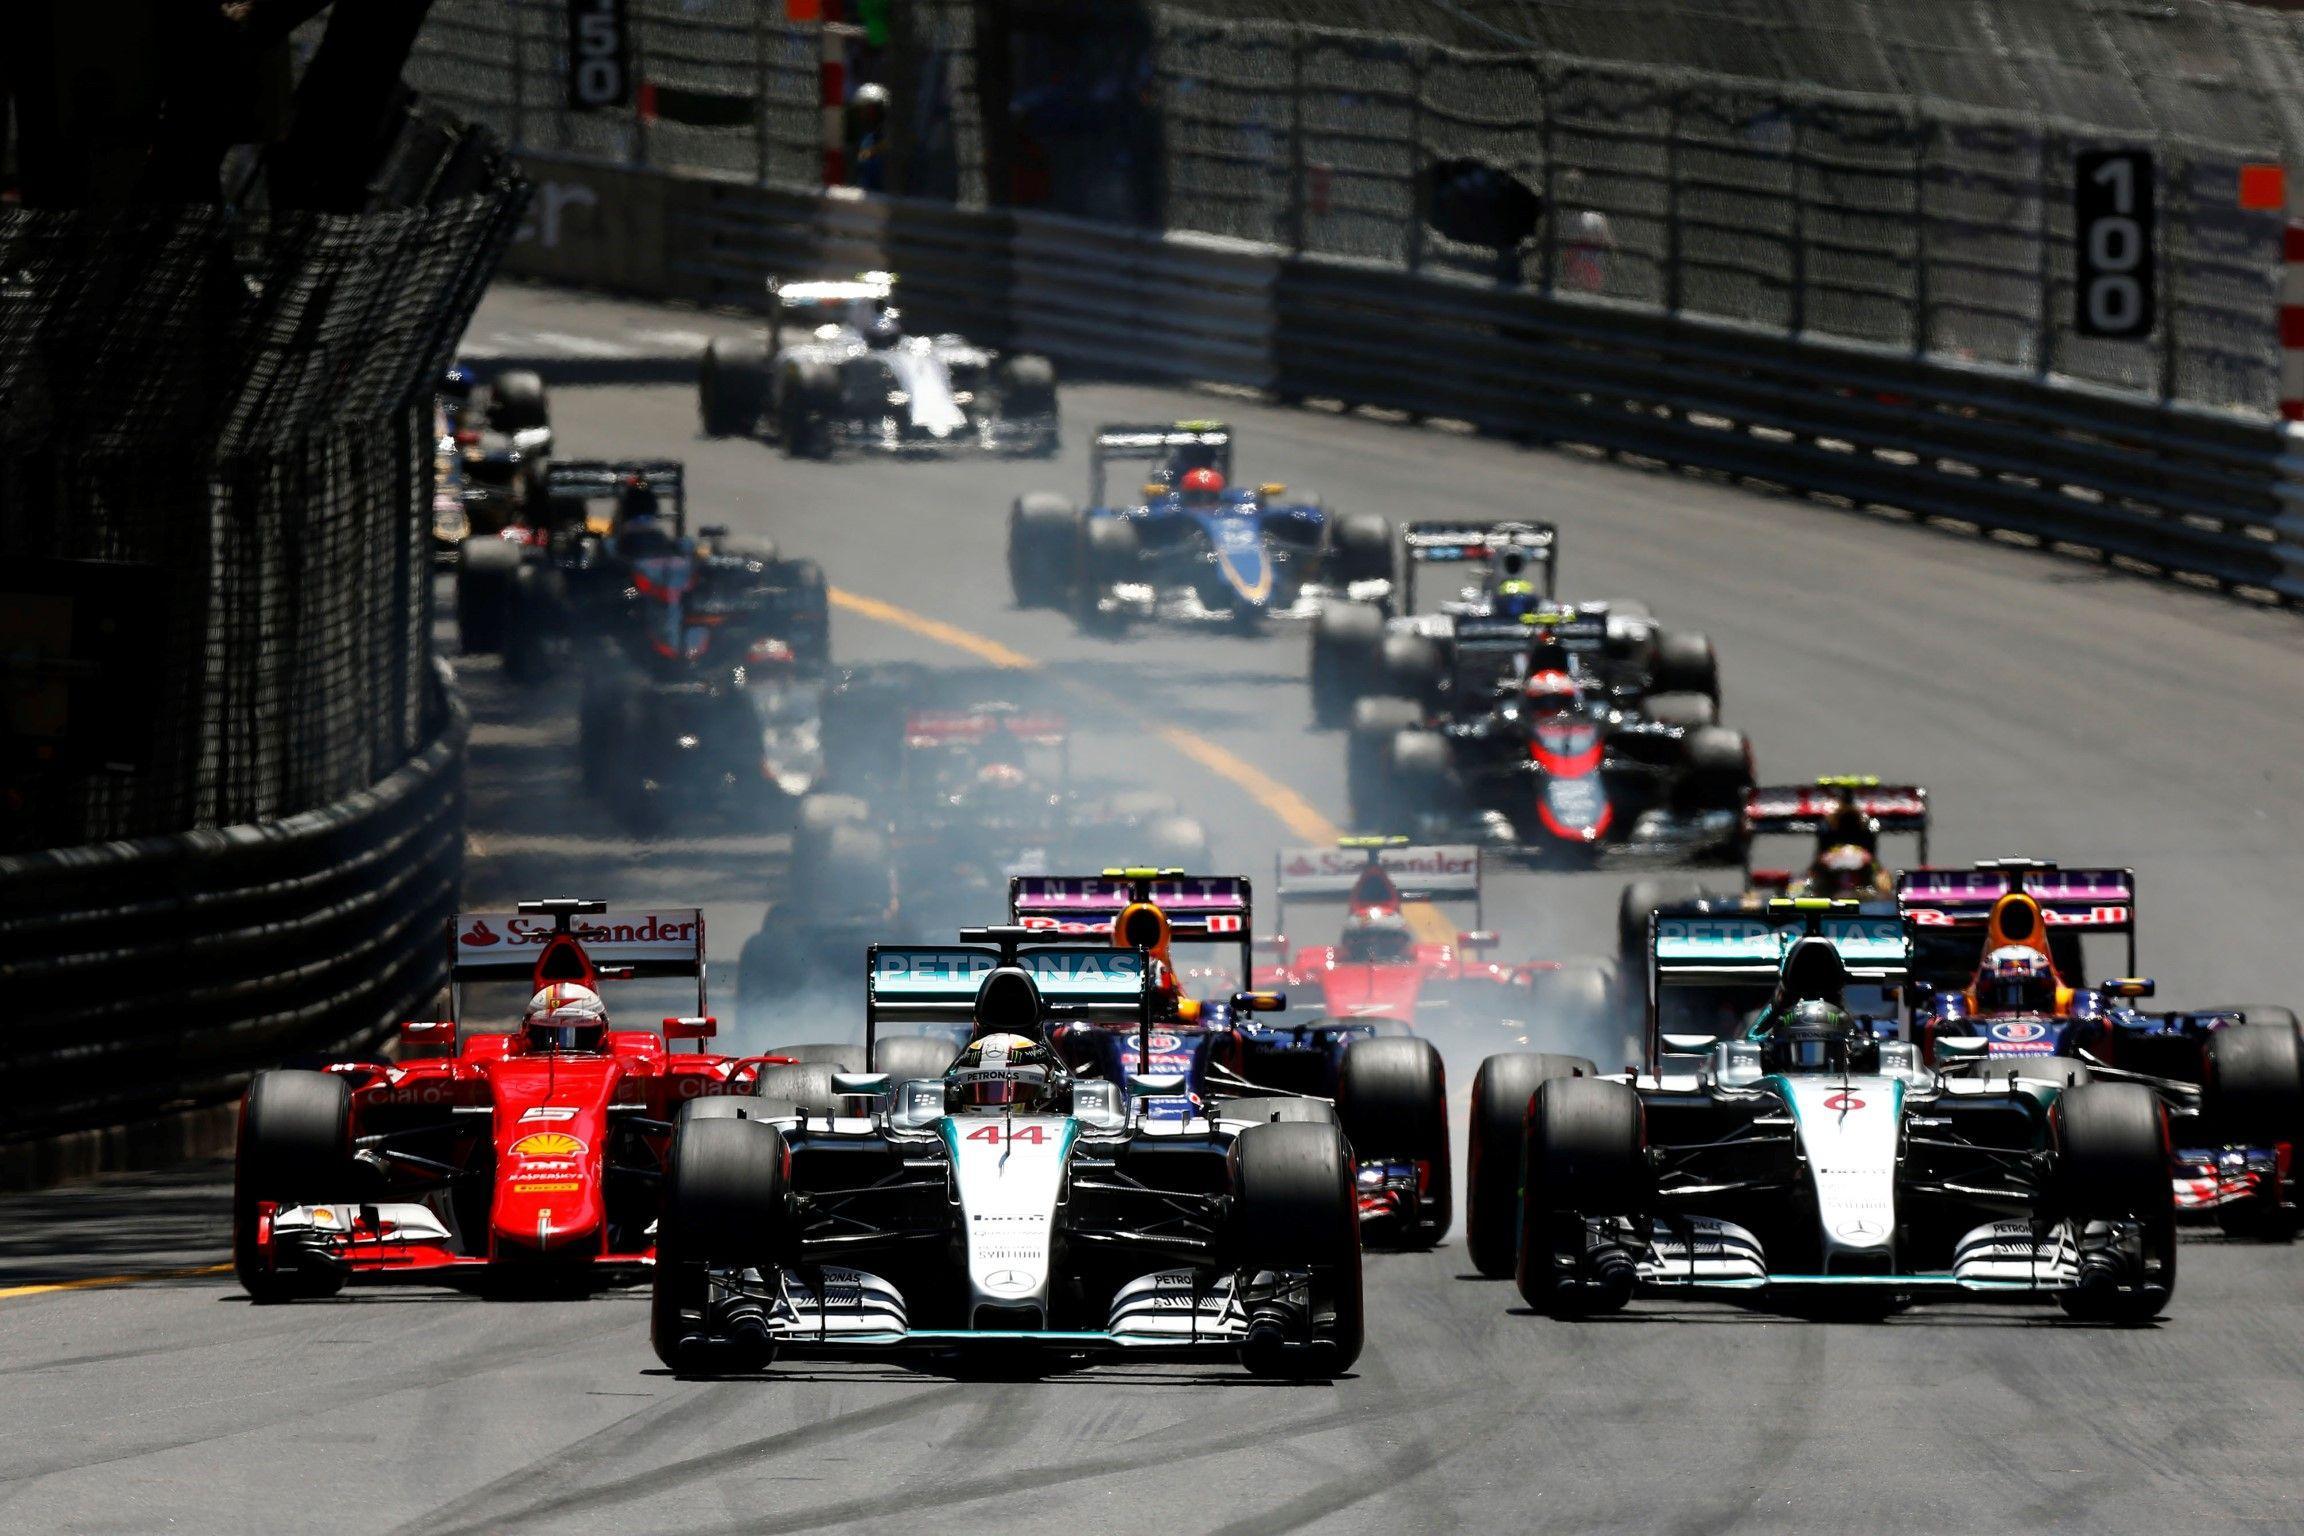 Monaco Grand Prix Wallpapers Wallpaper Cave